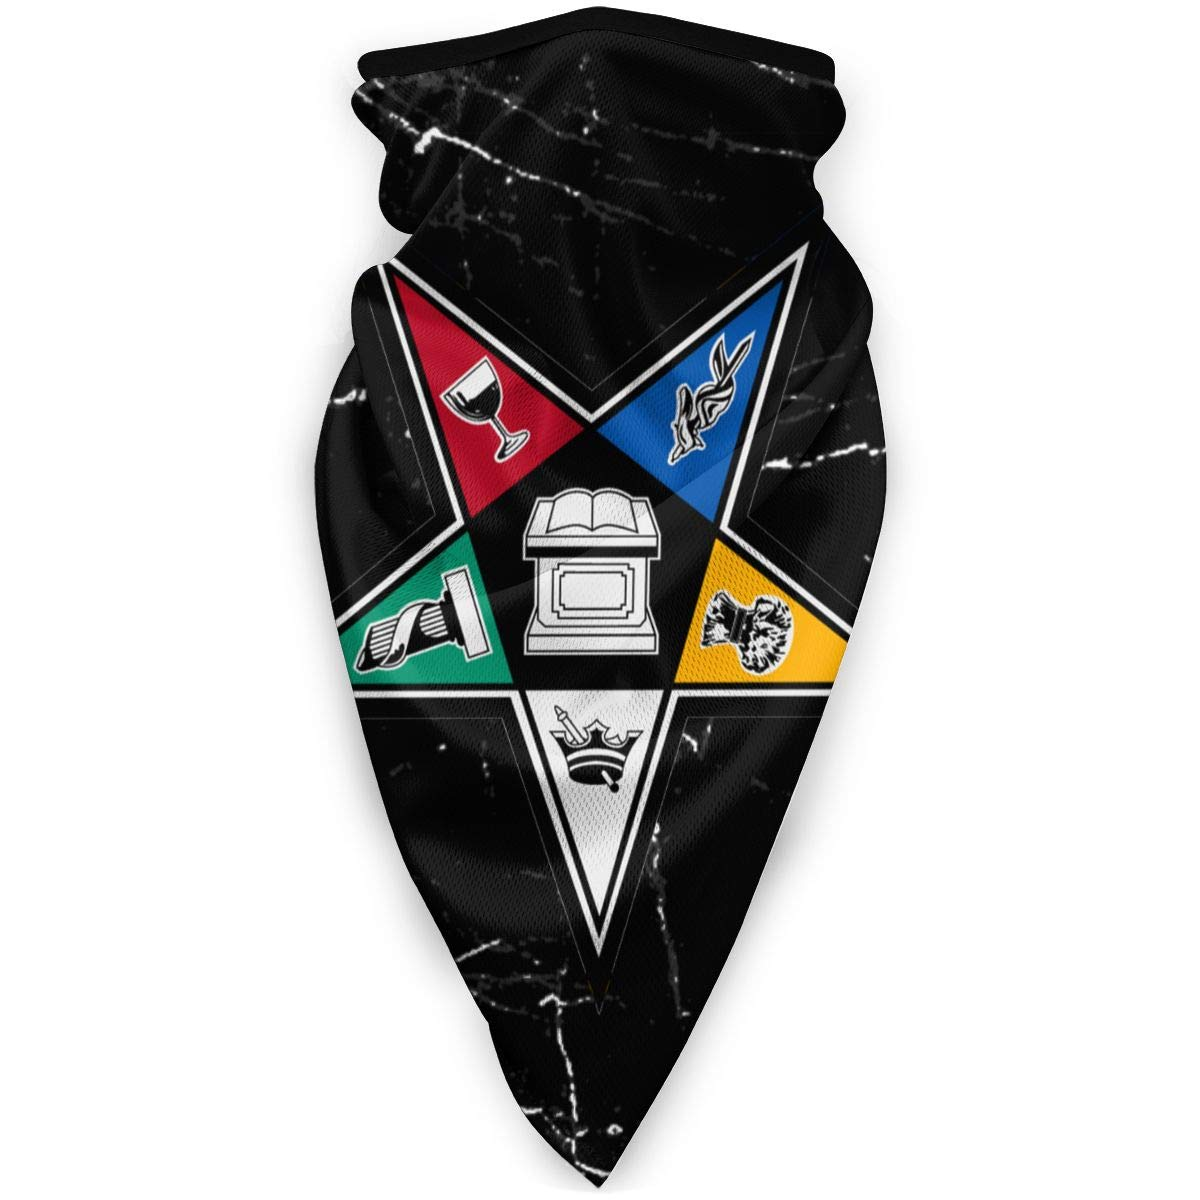 Order of Eastern Star Windproof Sports Mask Unisex Outdoor Mask Black